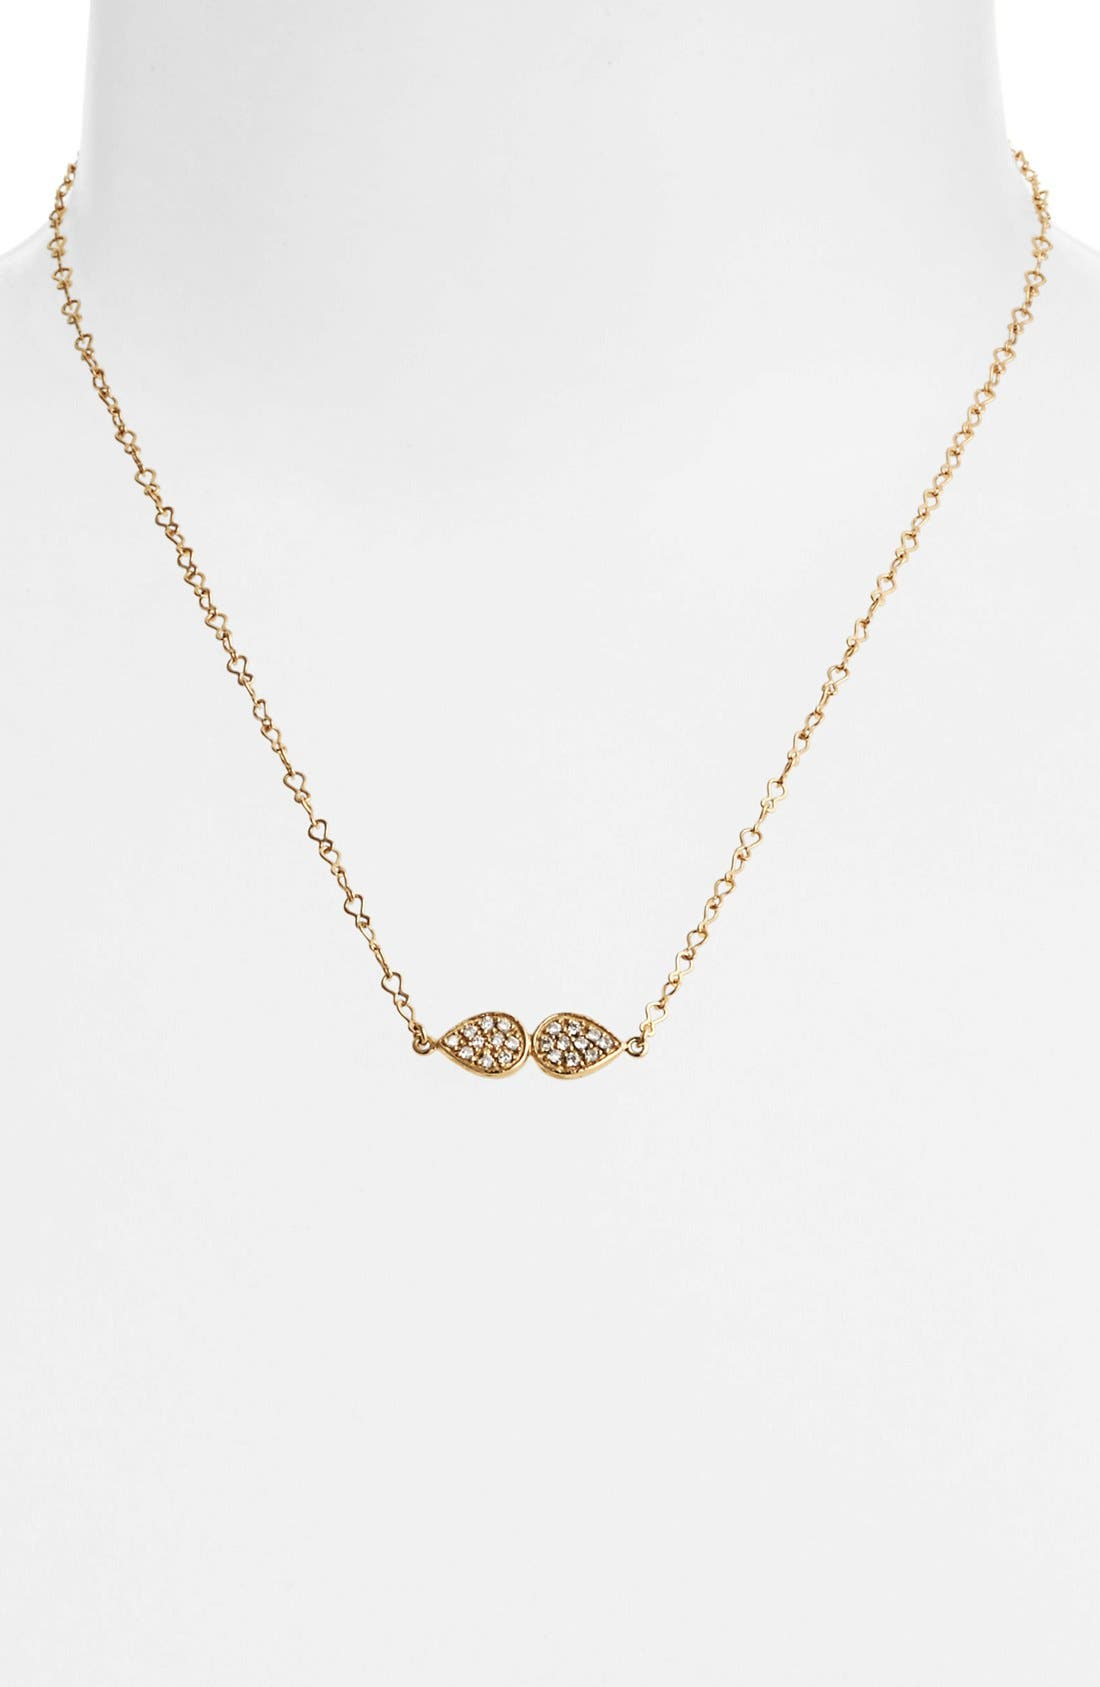 Main Image - Melinda Maria 'June - Leaf' Pendant Necklace